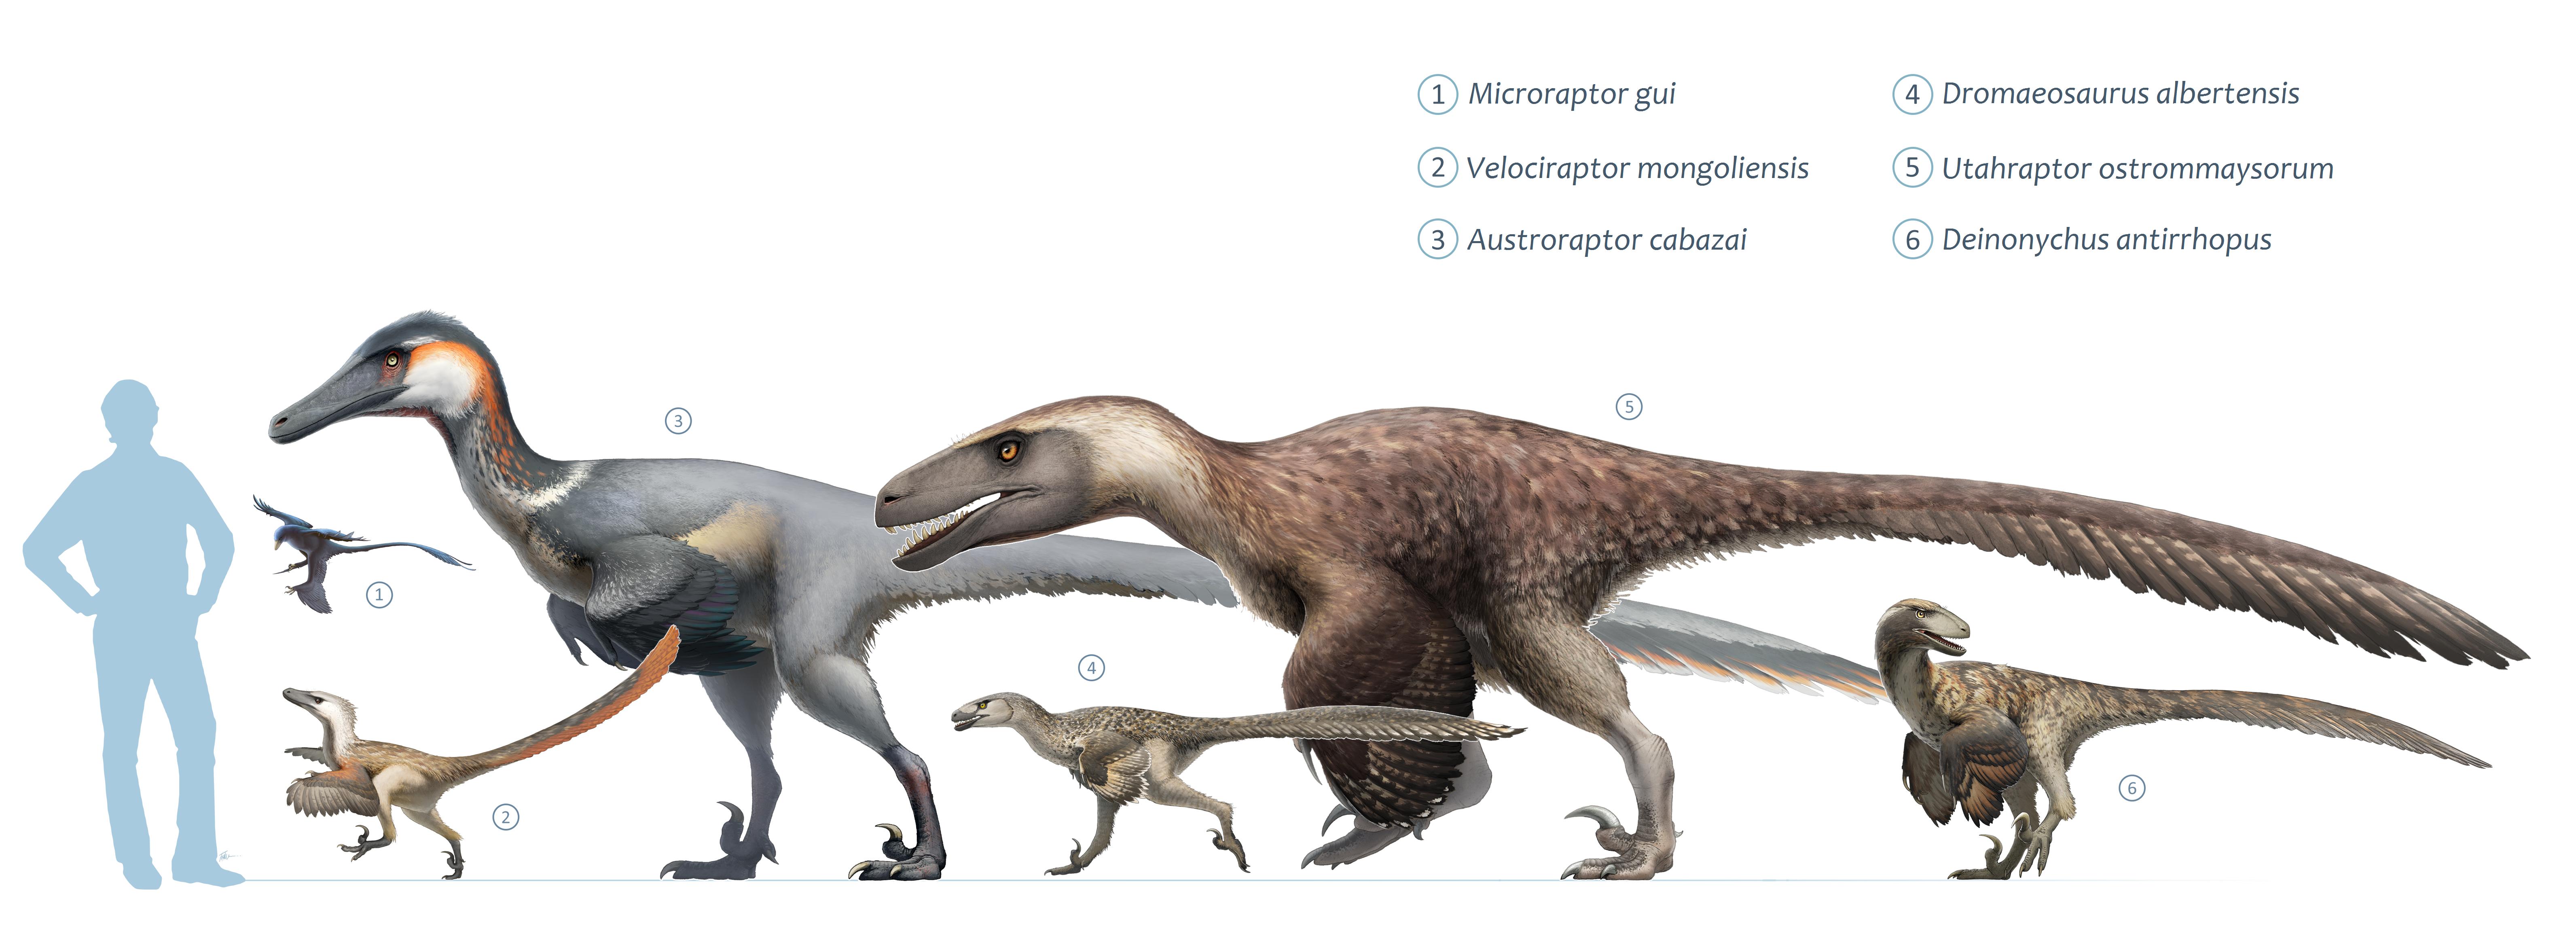 Dromaeosaurs.png